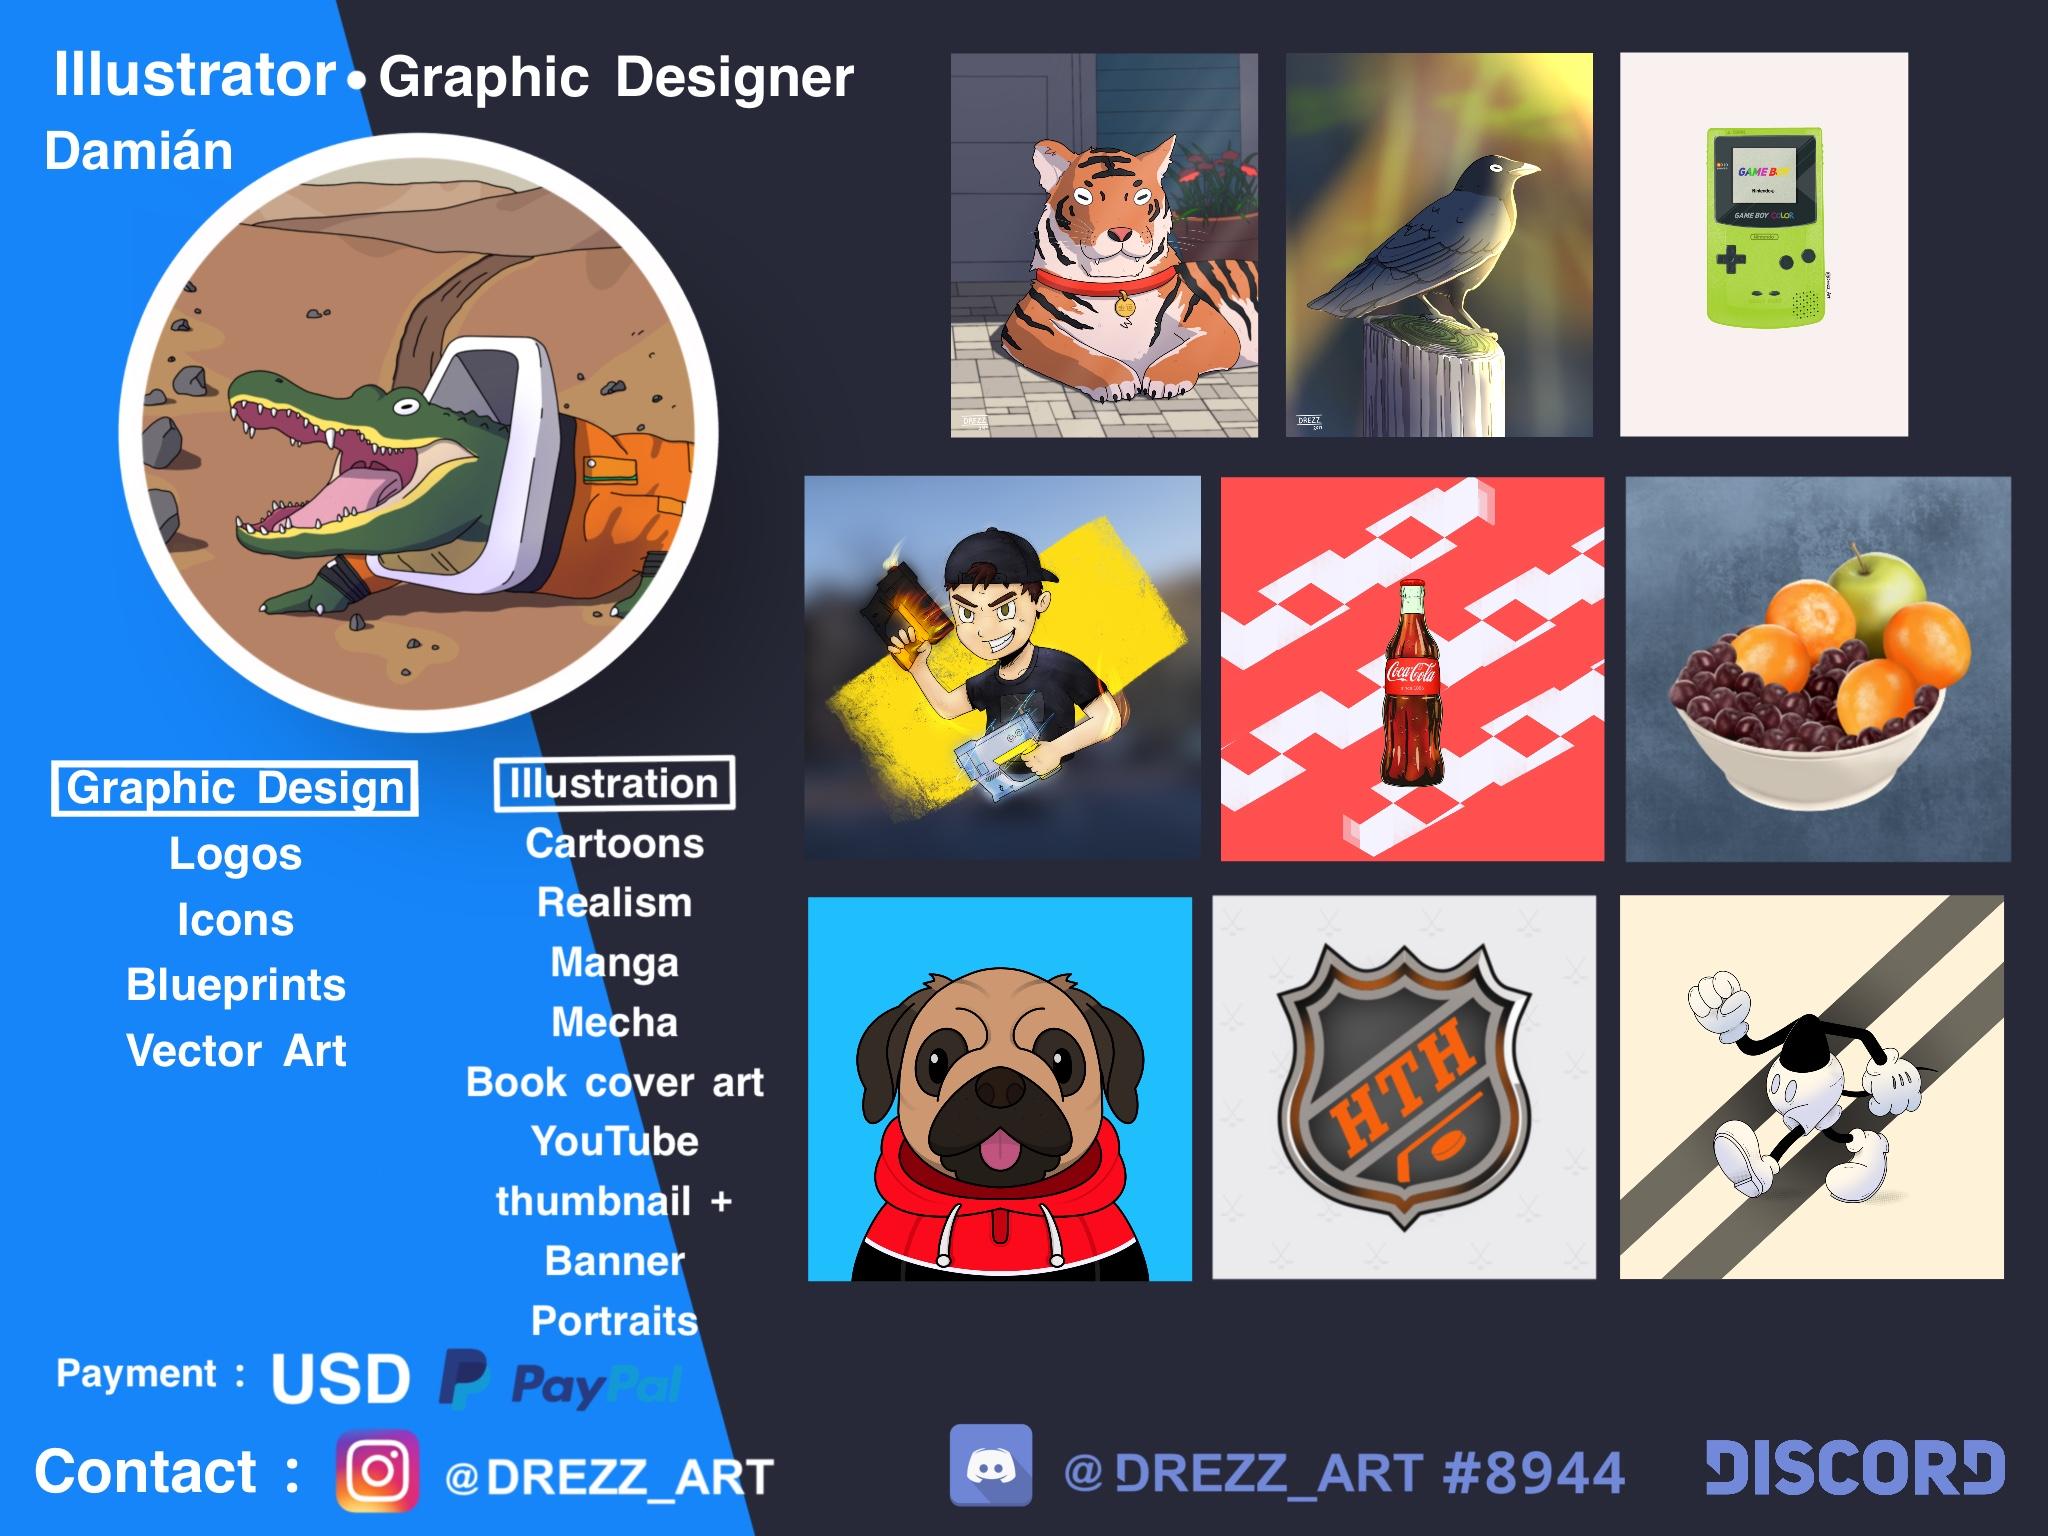 [Discord-Artist]: Drezz_Art#8944